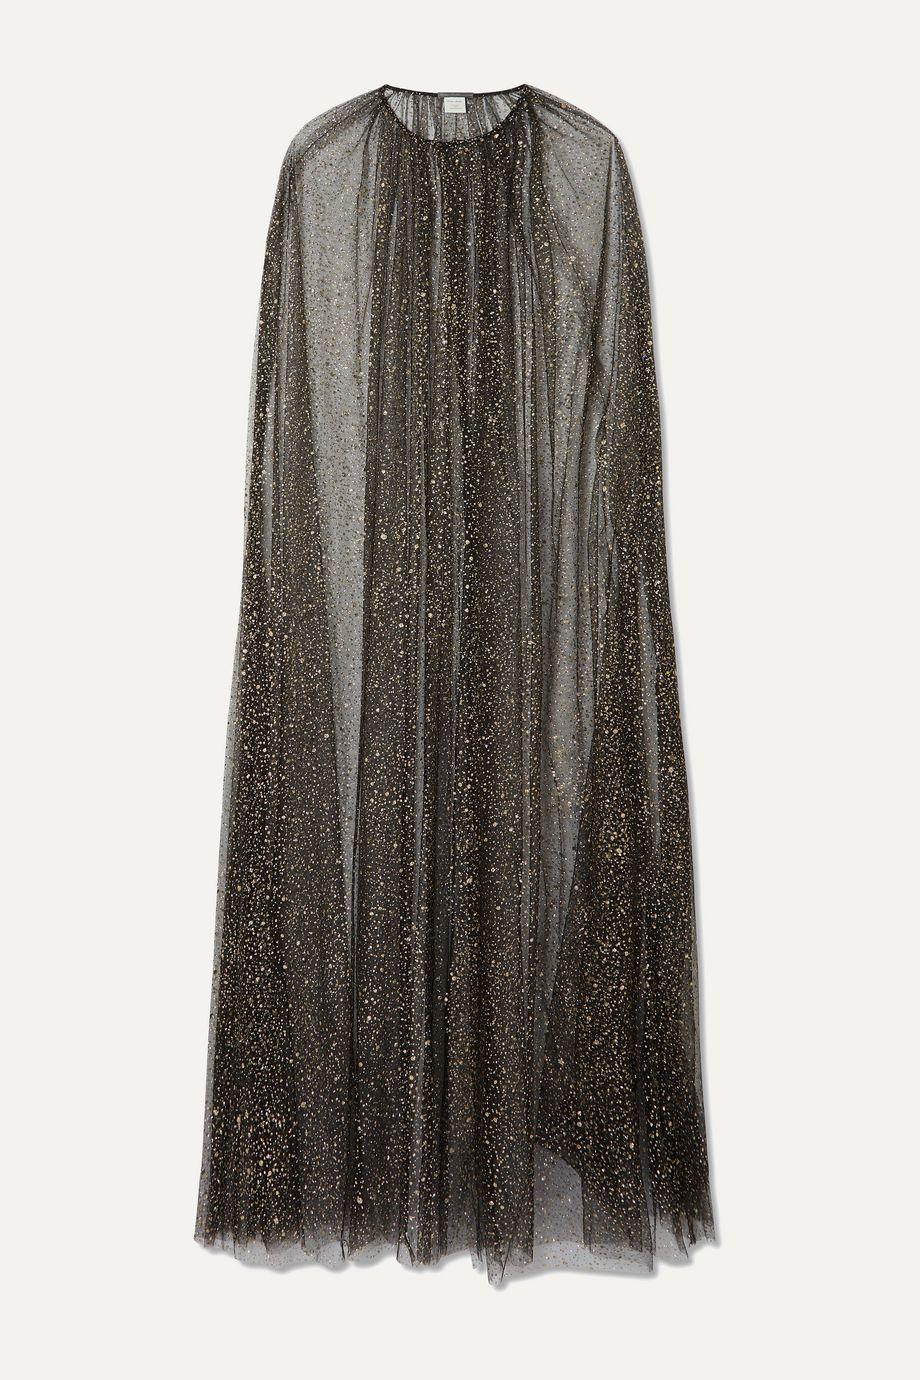 Monique Lhuillier Brie glittered tulle cape